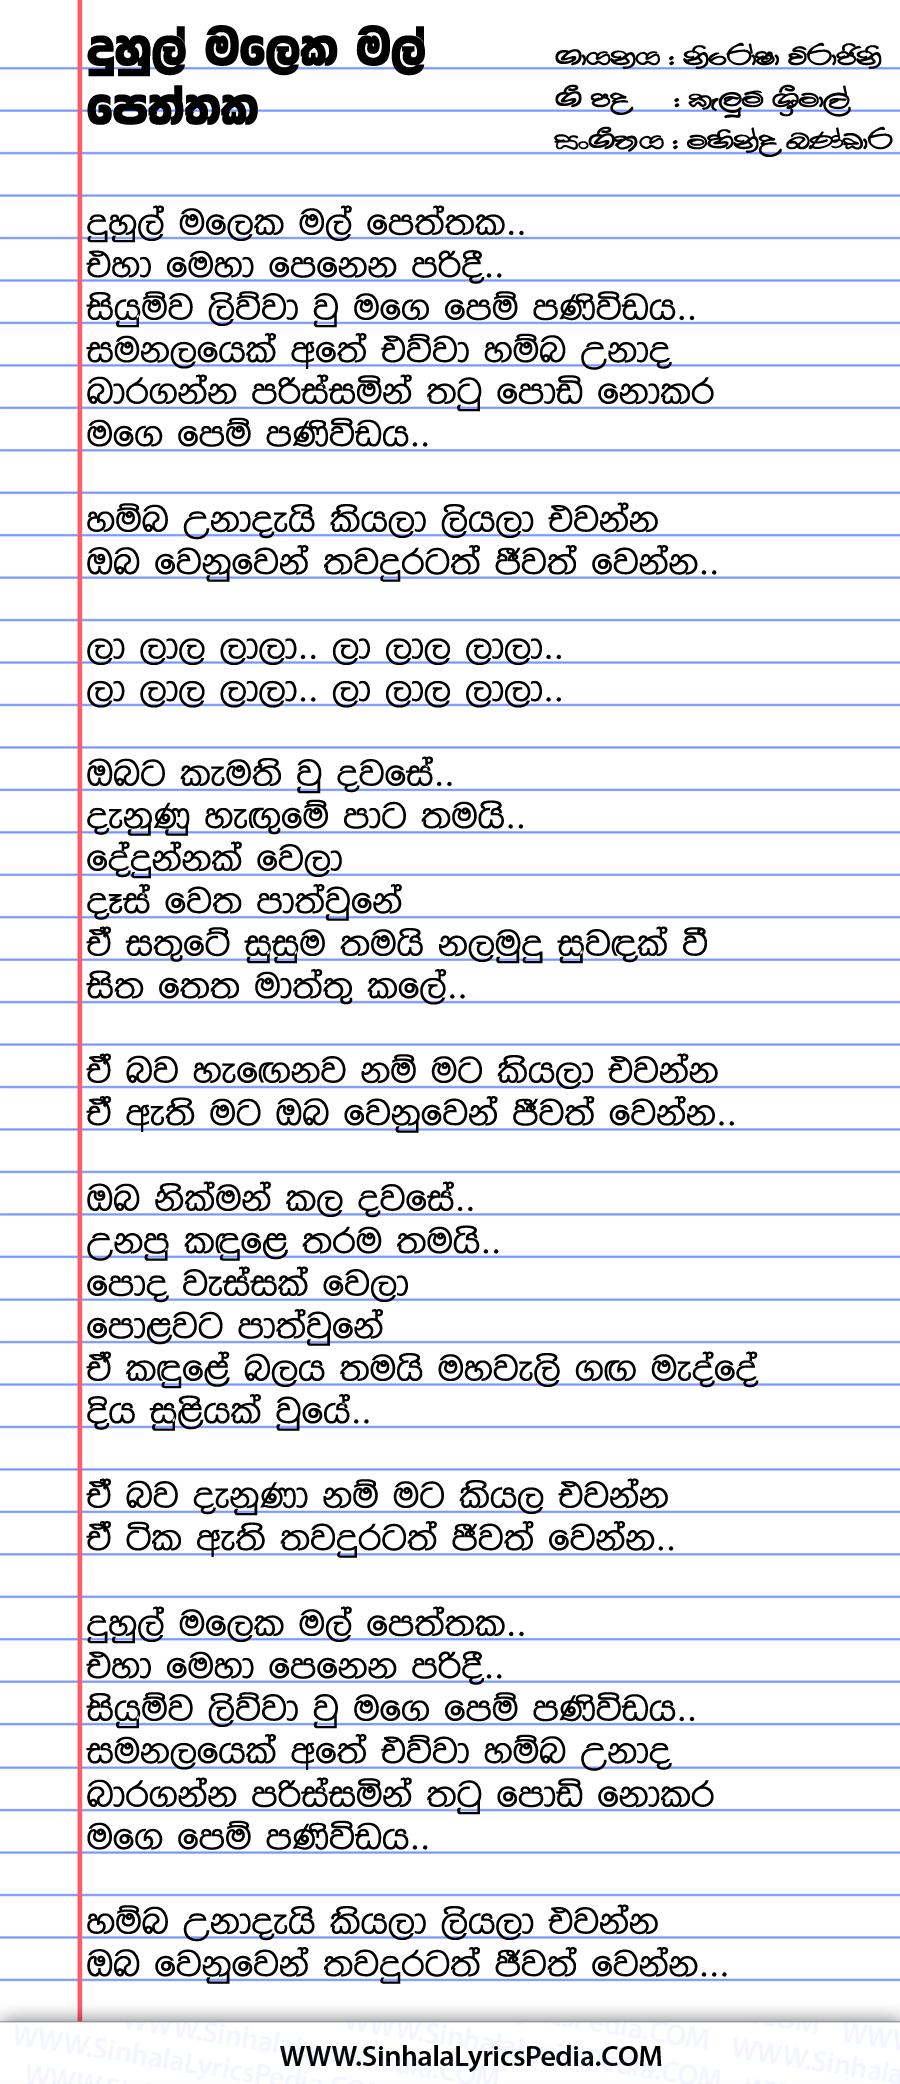 Duhul Malaka Mal Peththaka Song Lyrics